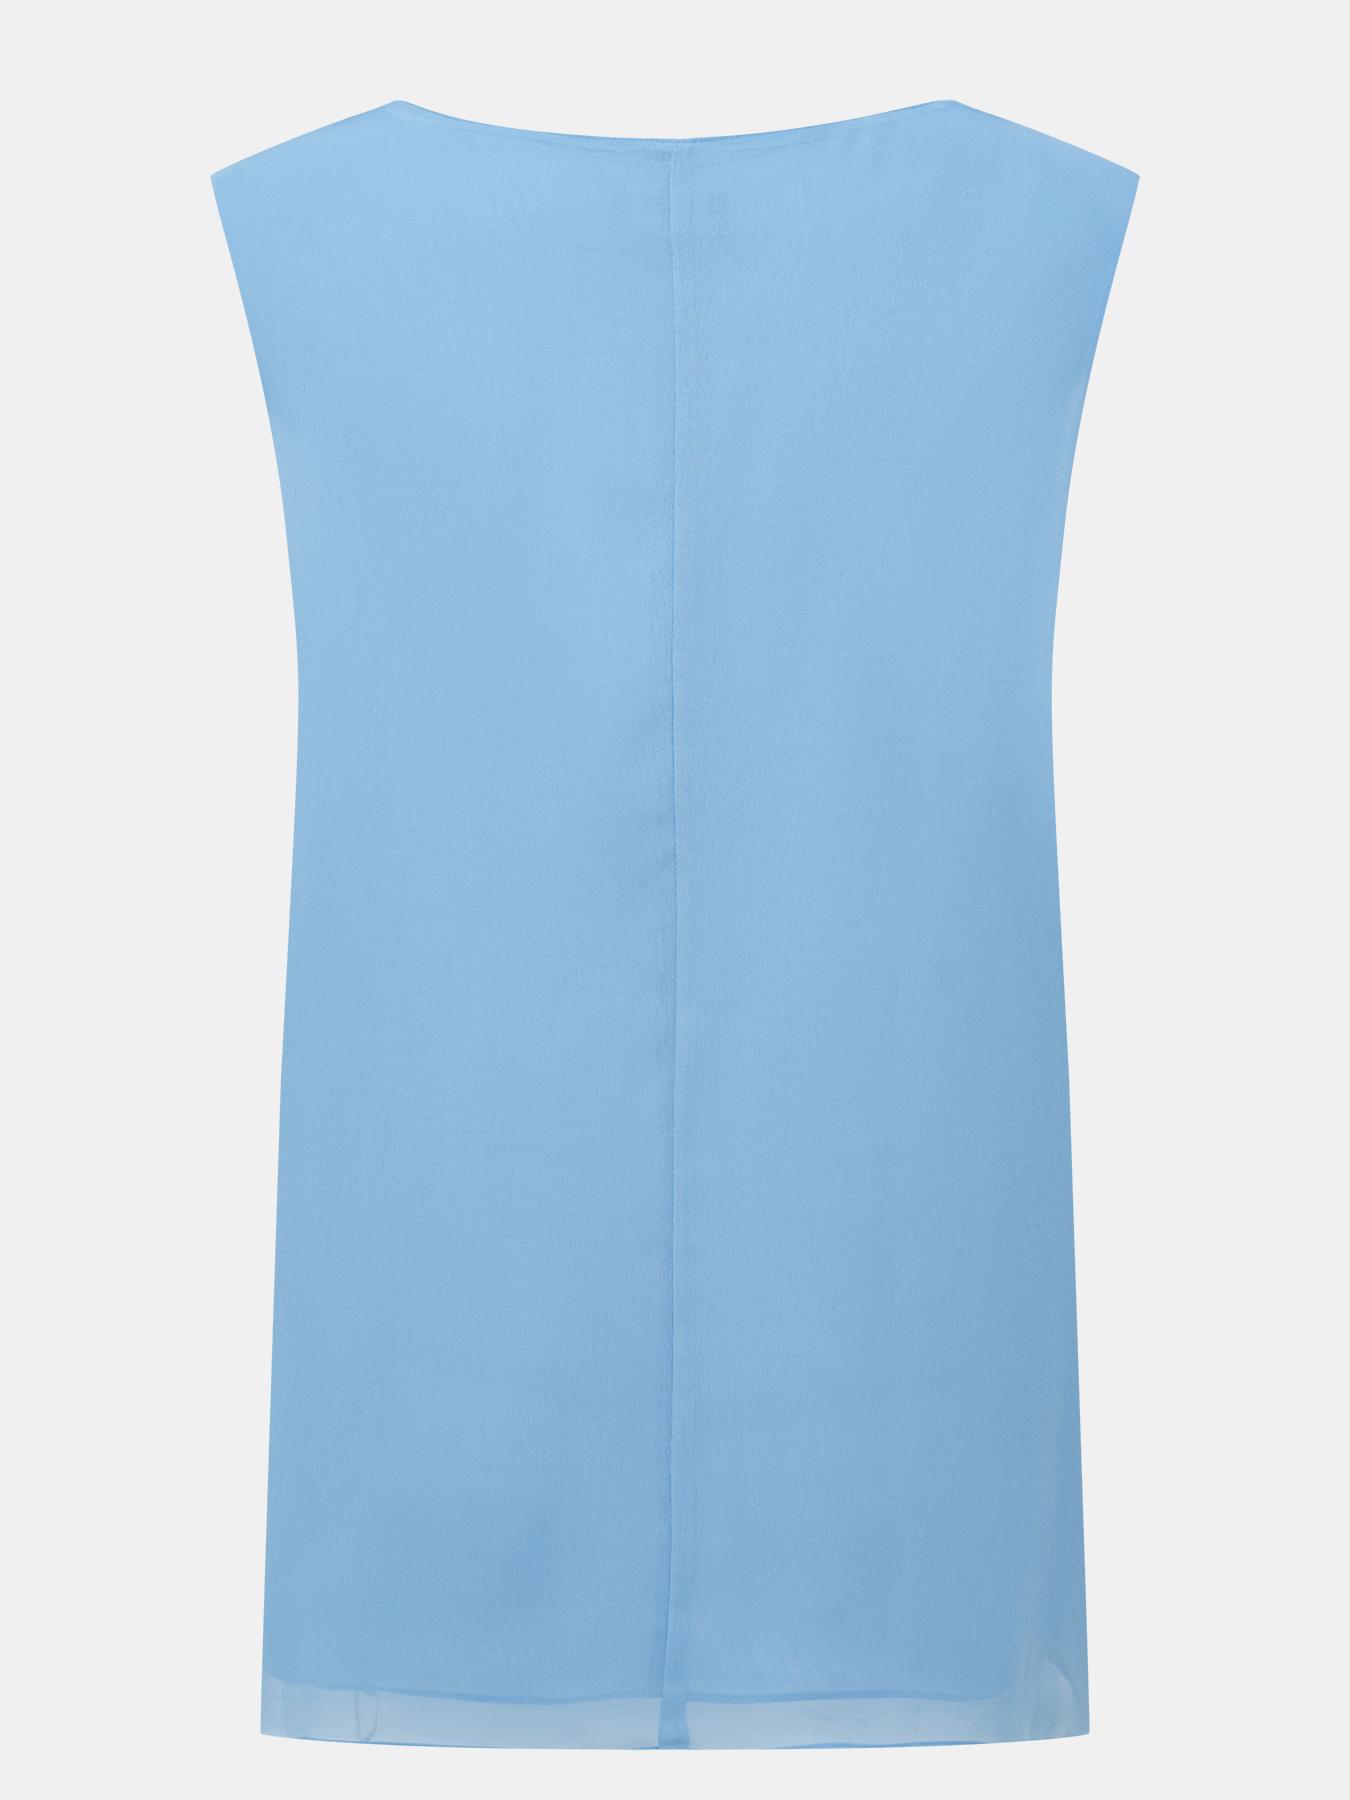 Блузка Samoon Блузка блузка samoon блузка